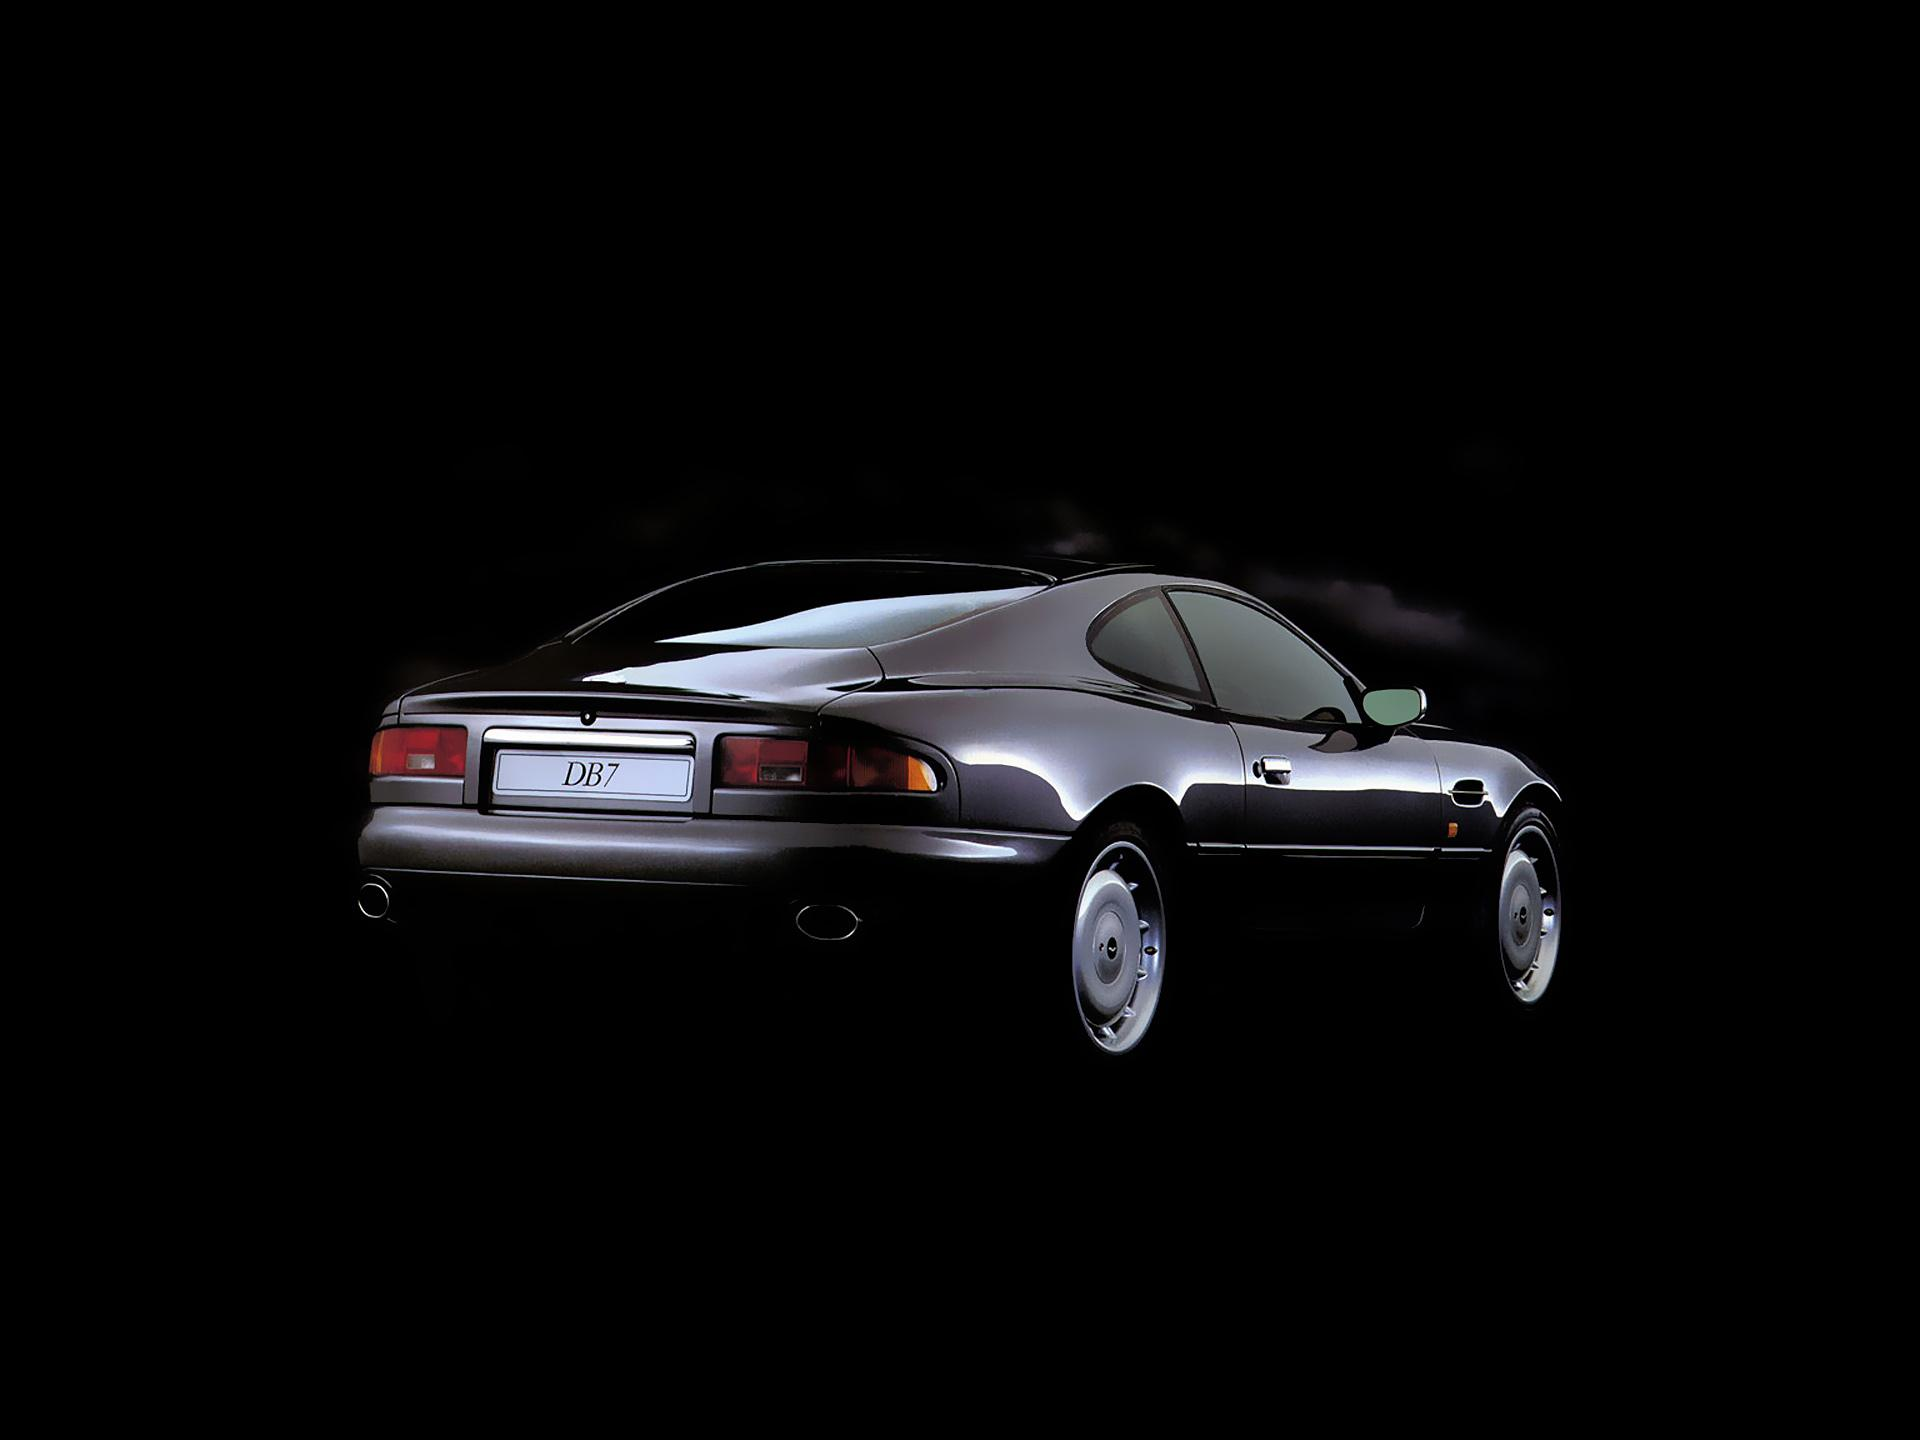 Aston Martin DB7 wallpapers HD quality